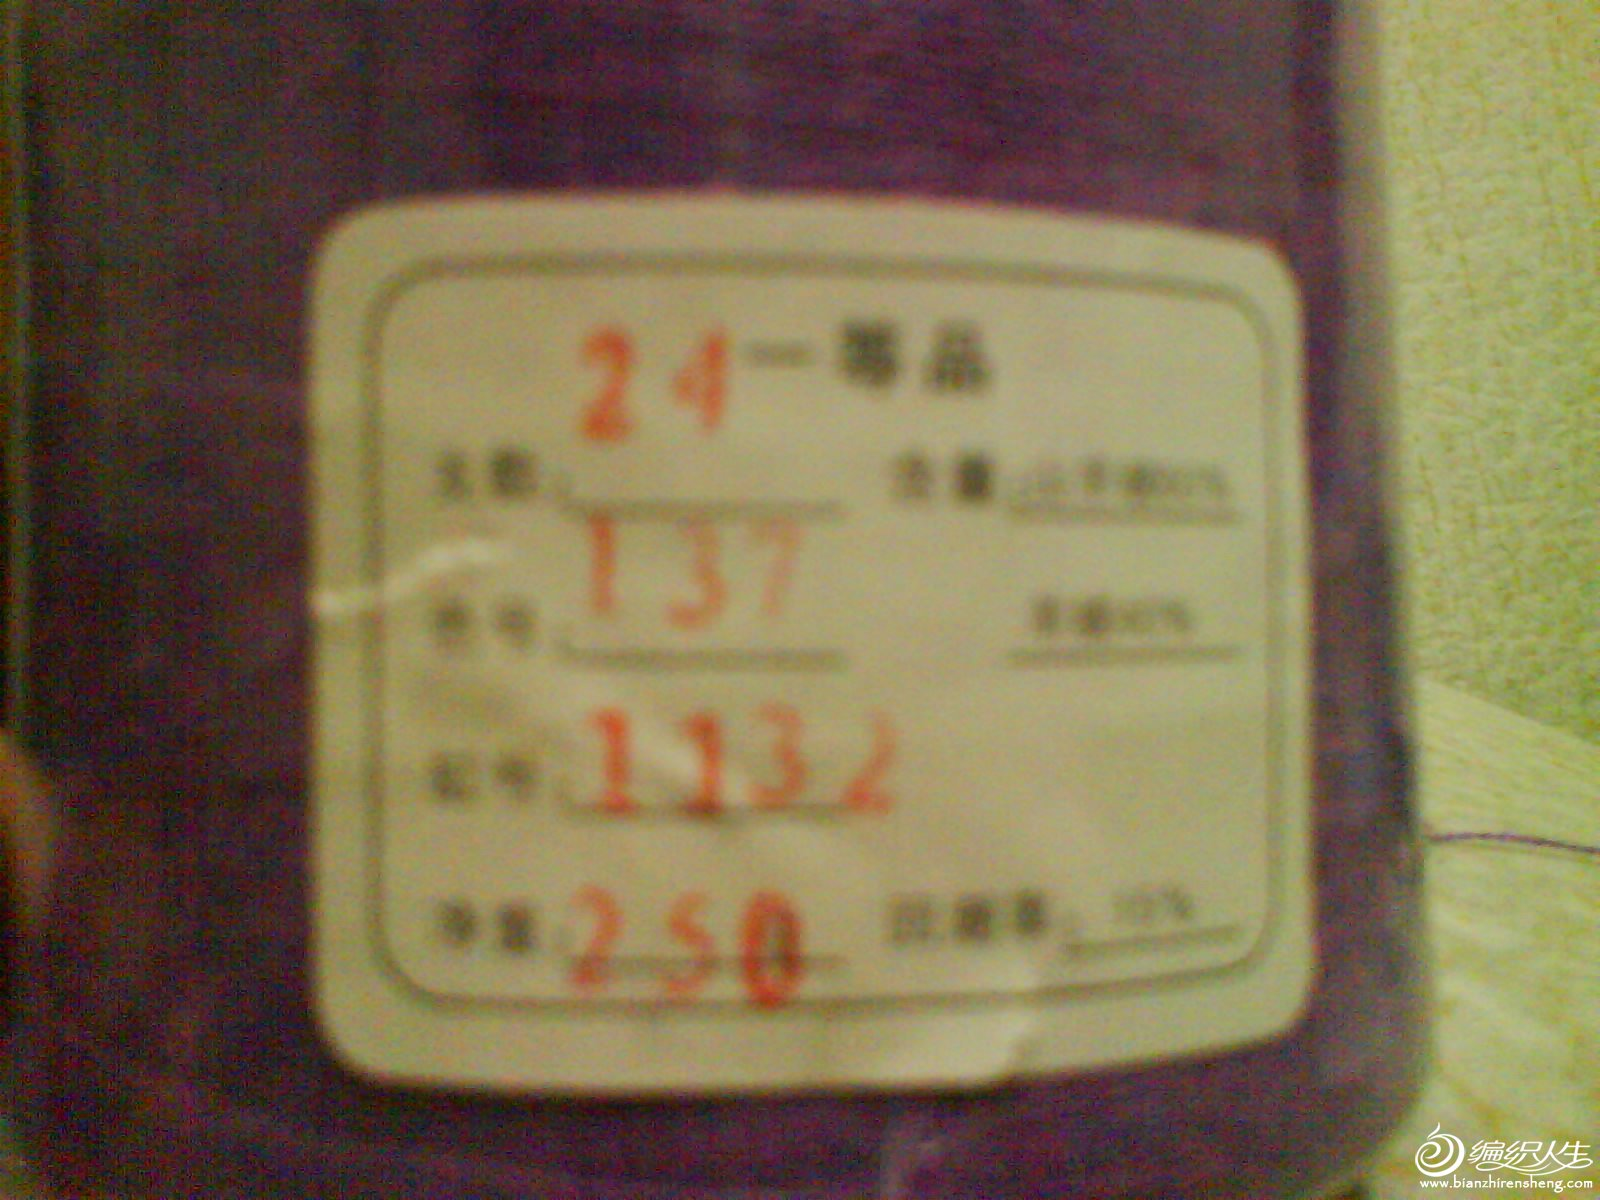 DSC03126.JPG